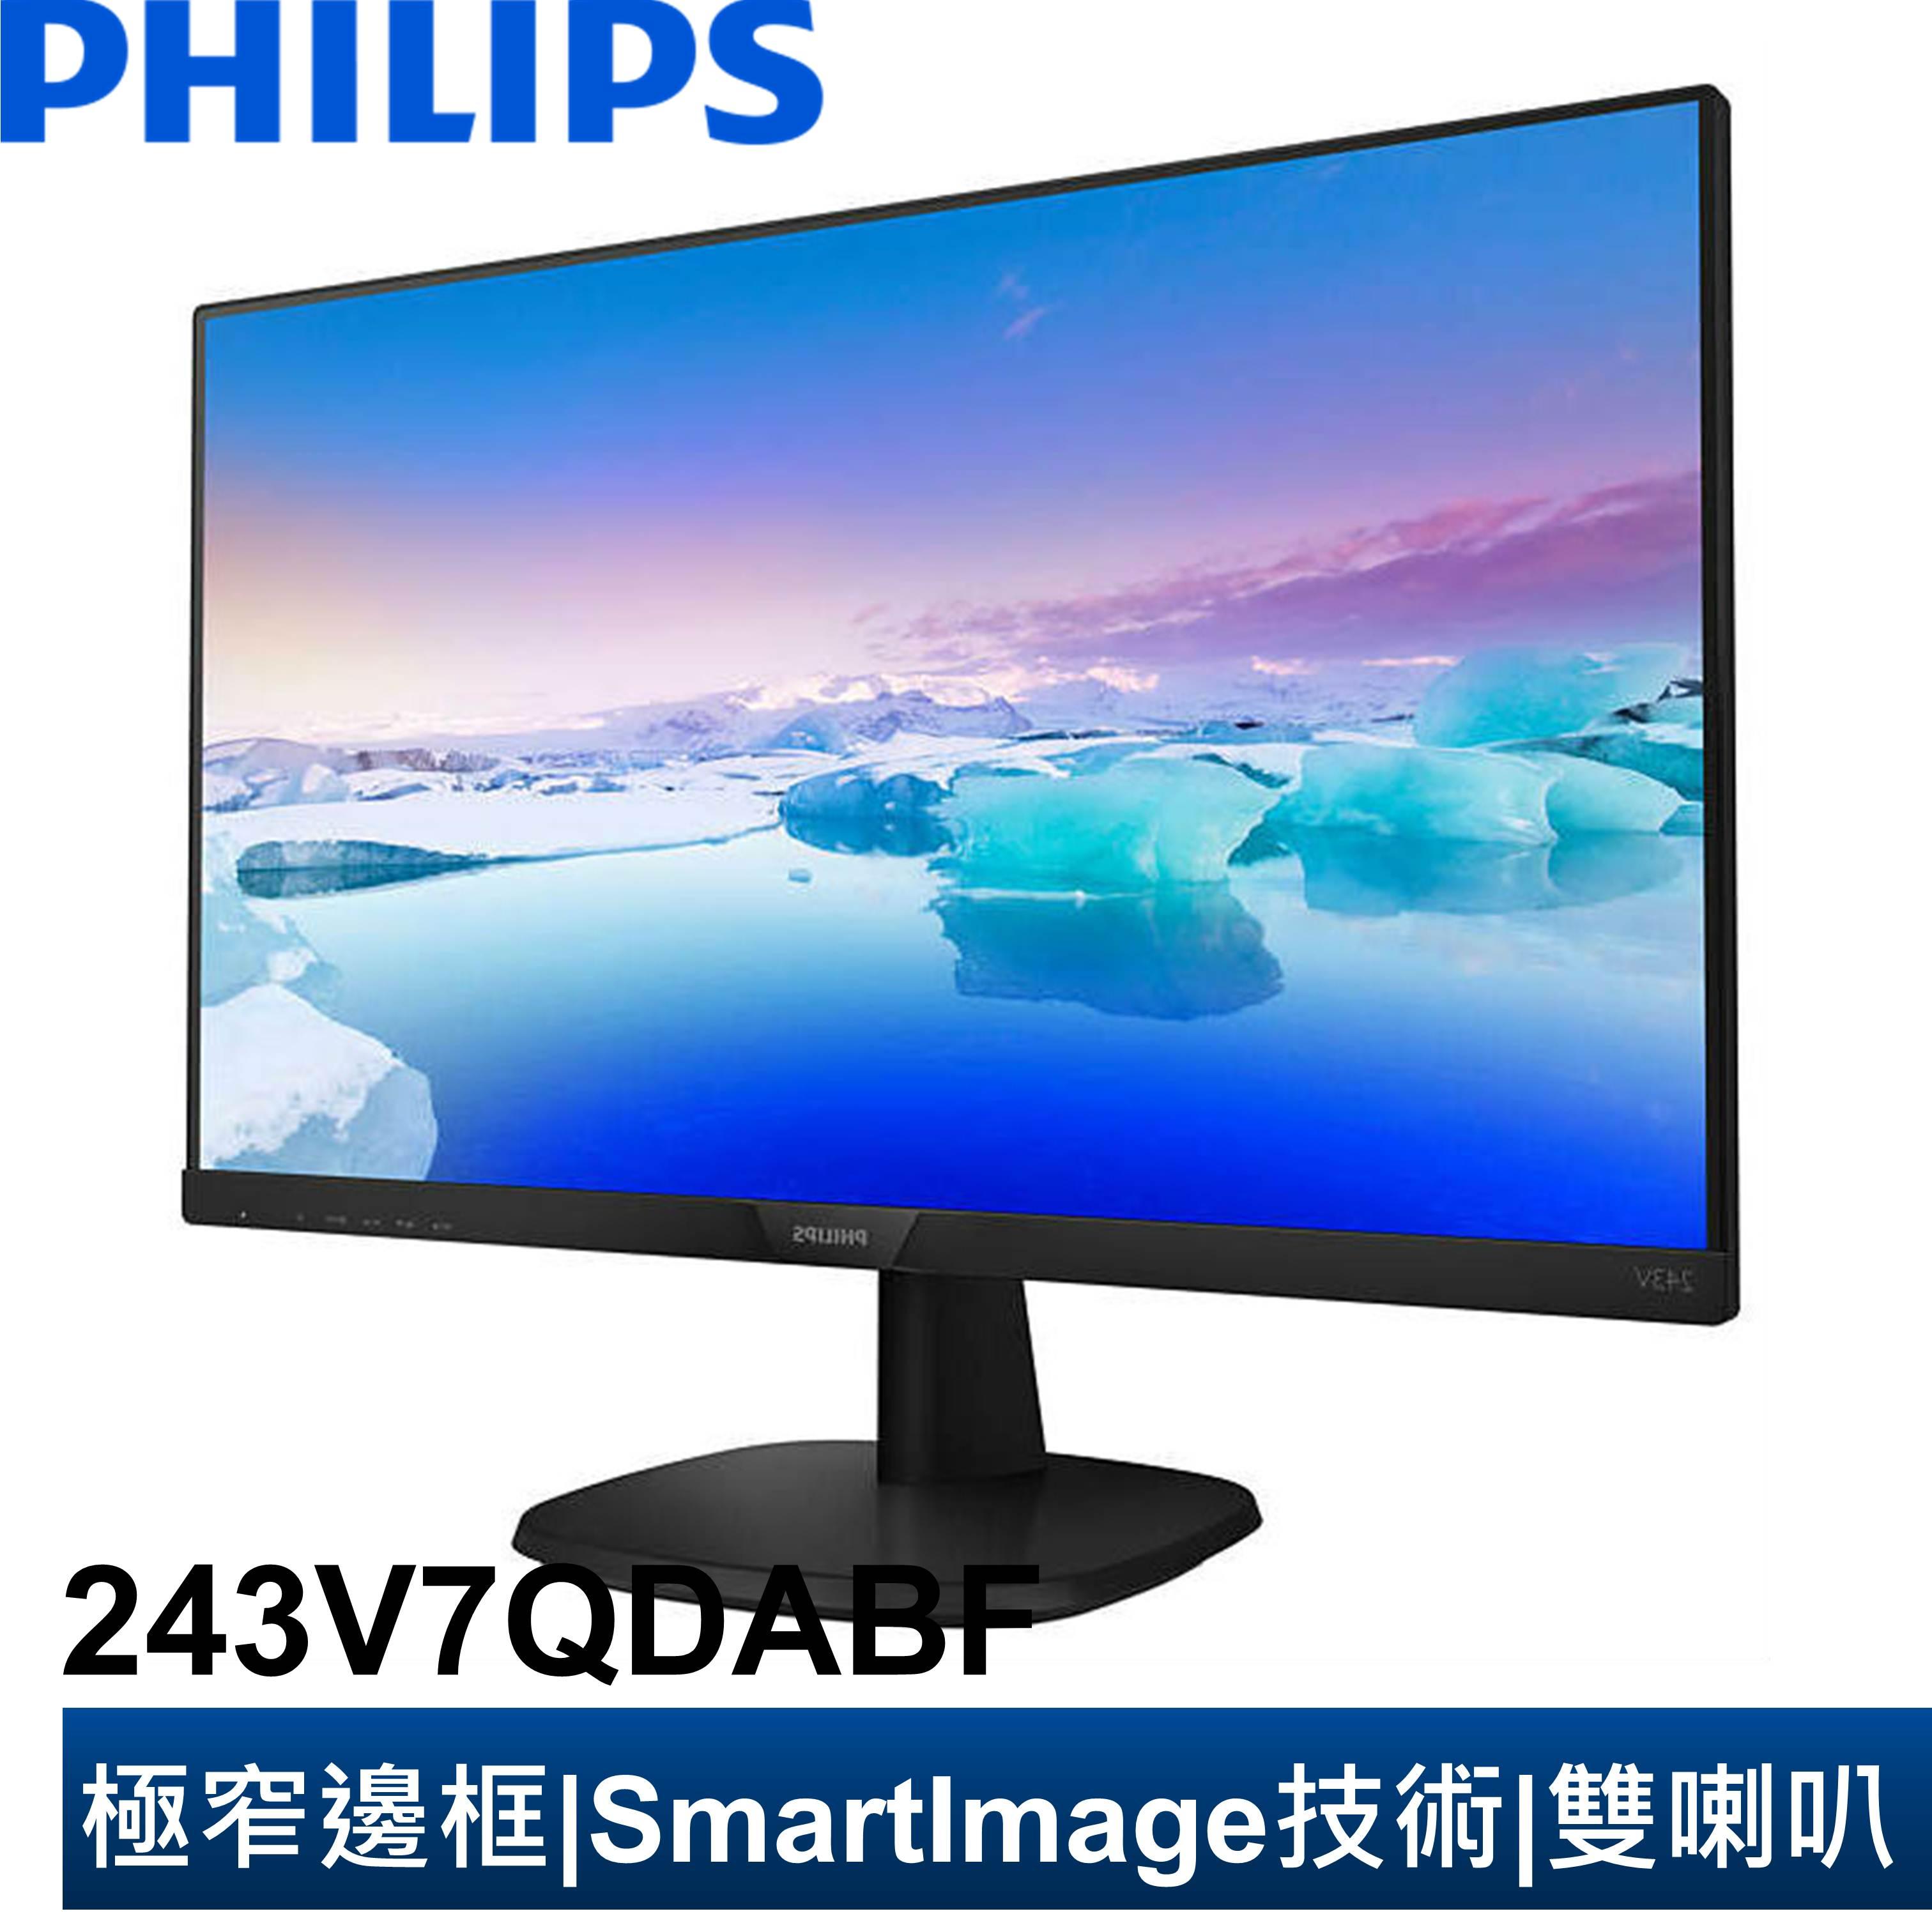 PHILIPS 243V7QDABF 24型IPS廣視角螢幕